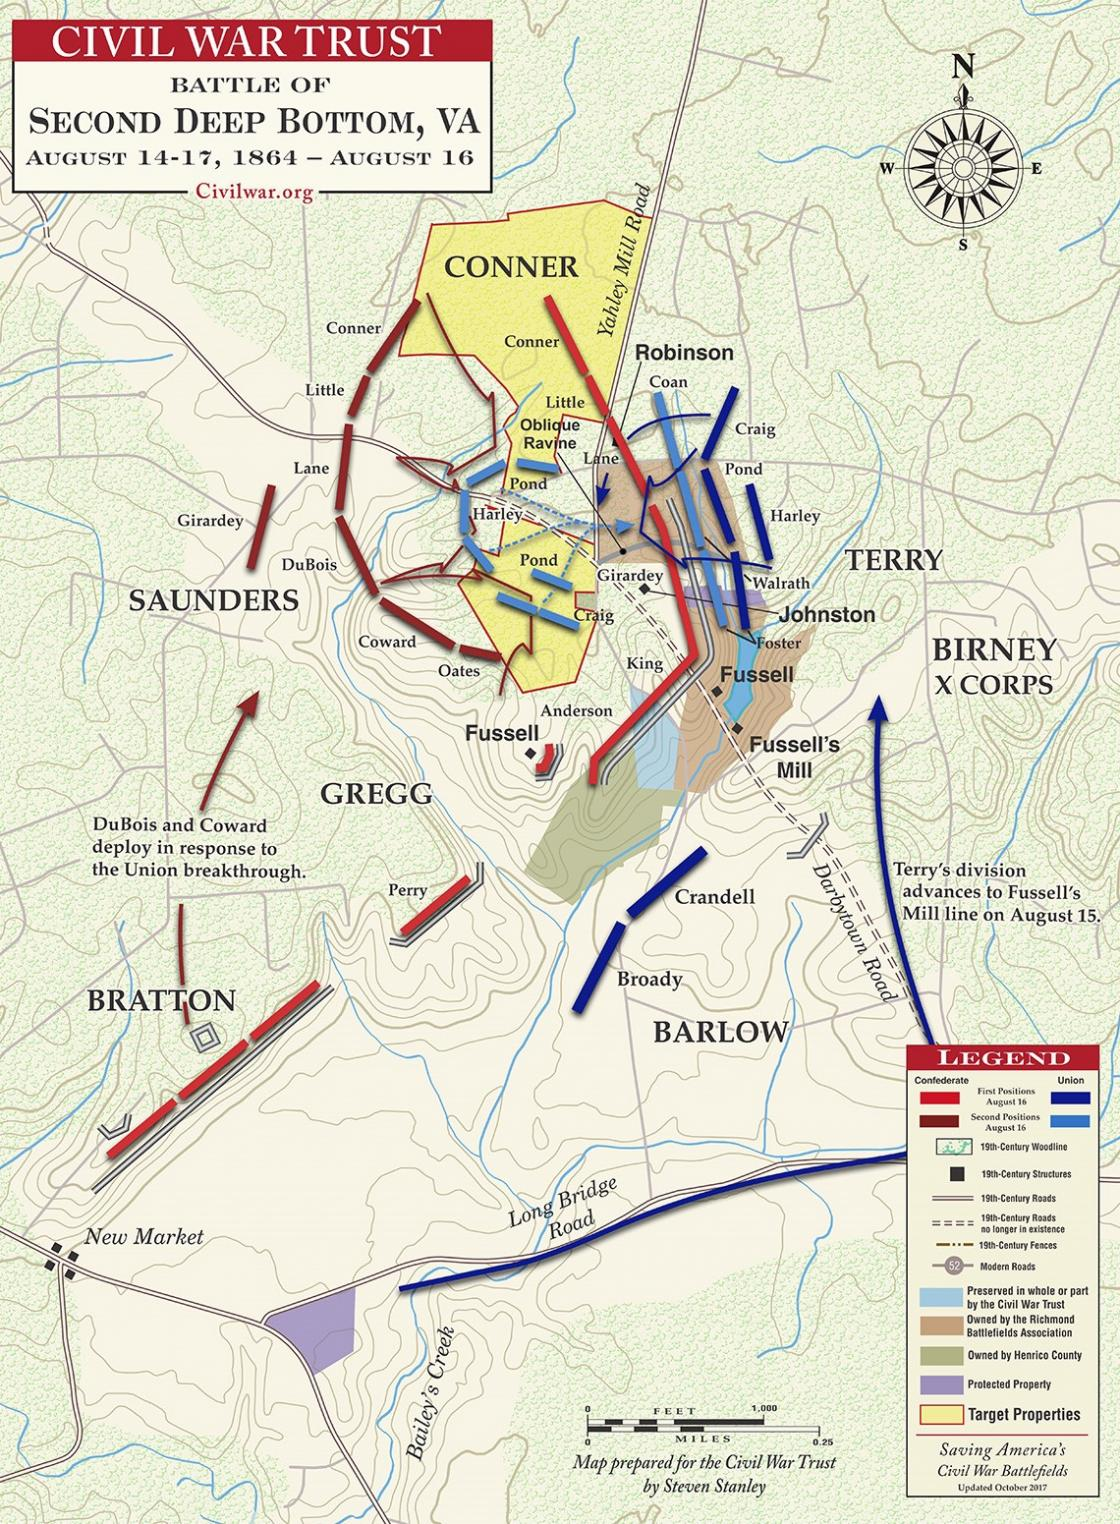 Second Deep Bottom - August 14-17, 1864 - August 16 Fighting